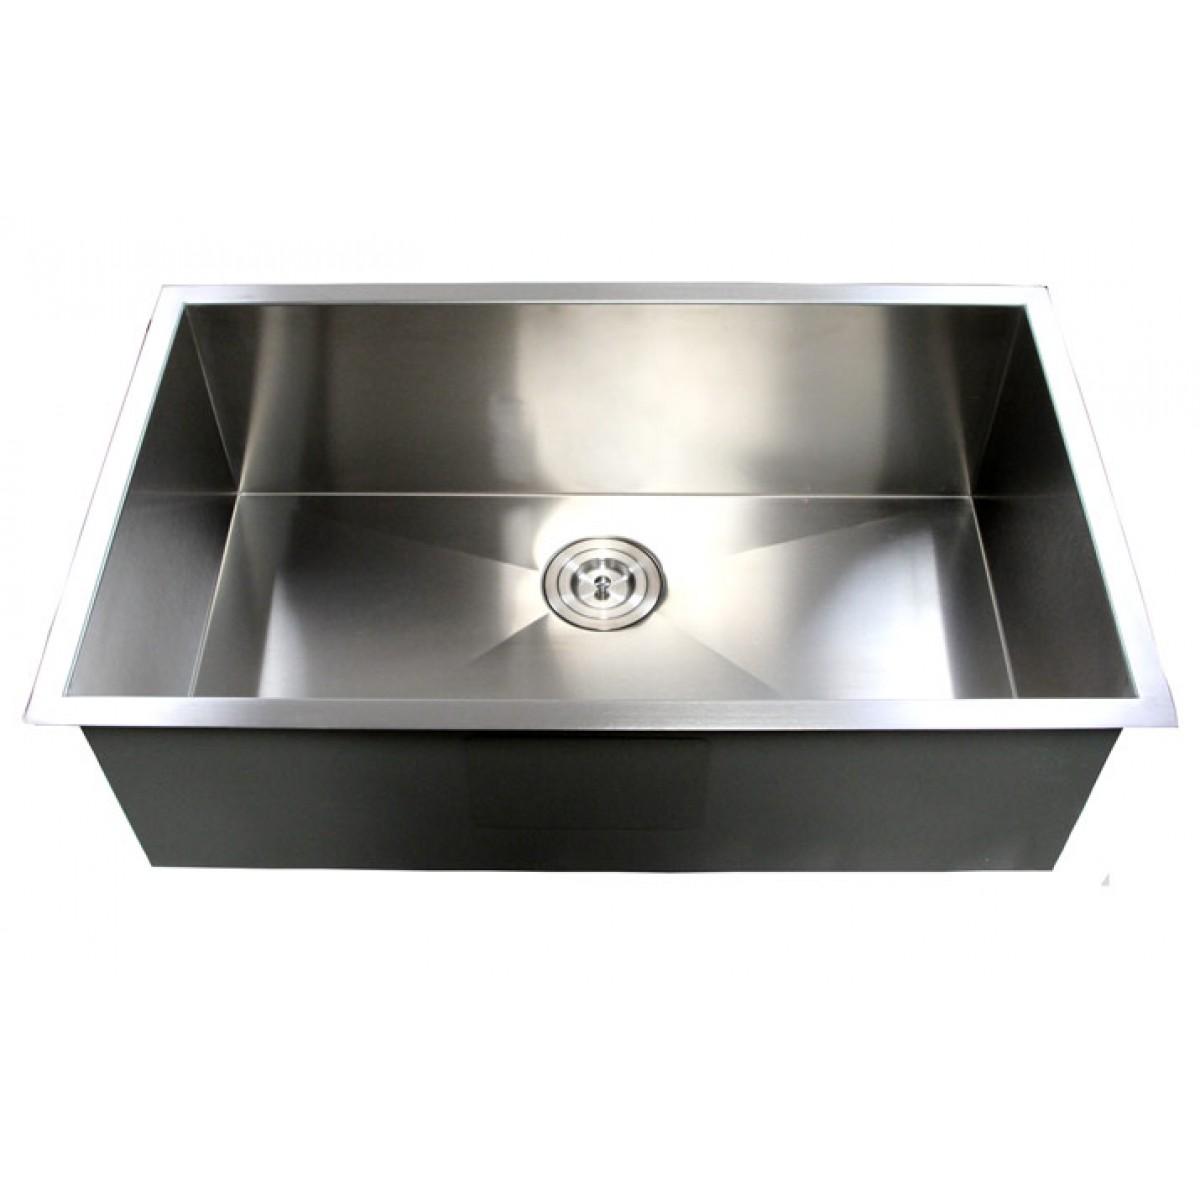 ... Stainless Steel Undermount Single Bowl Kitchen Sink Zero Radius Design